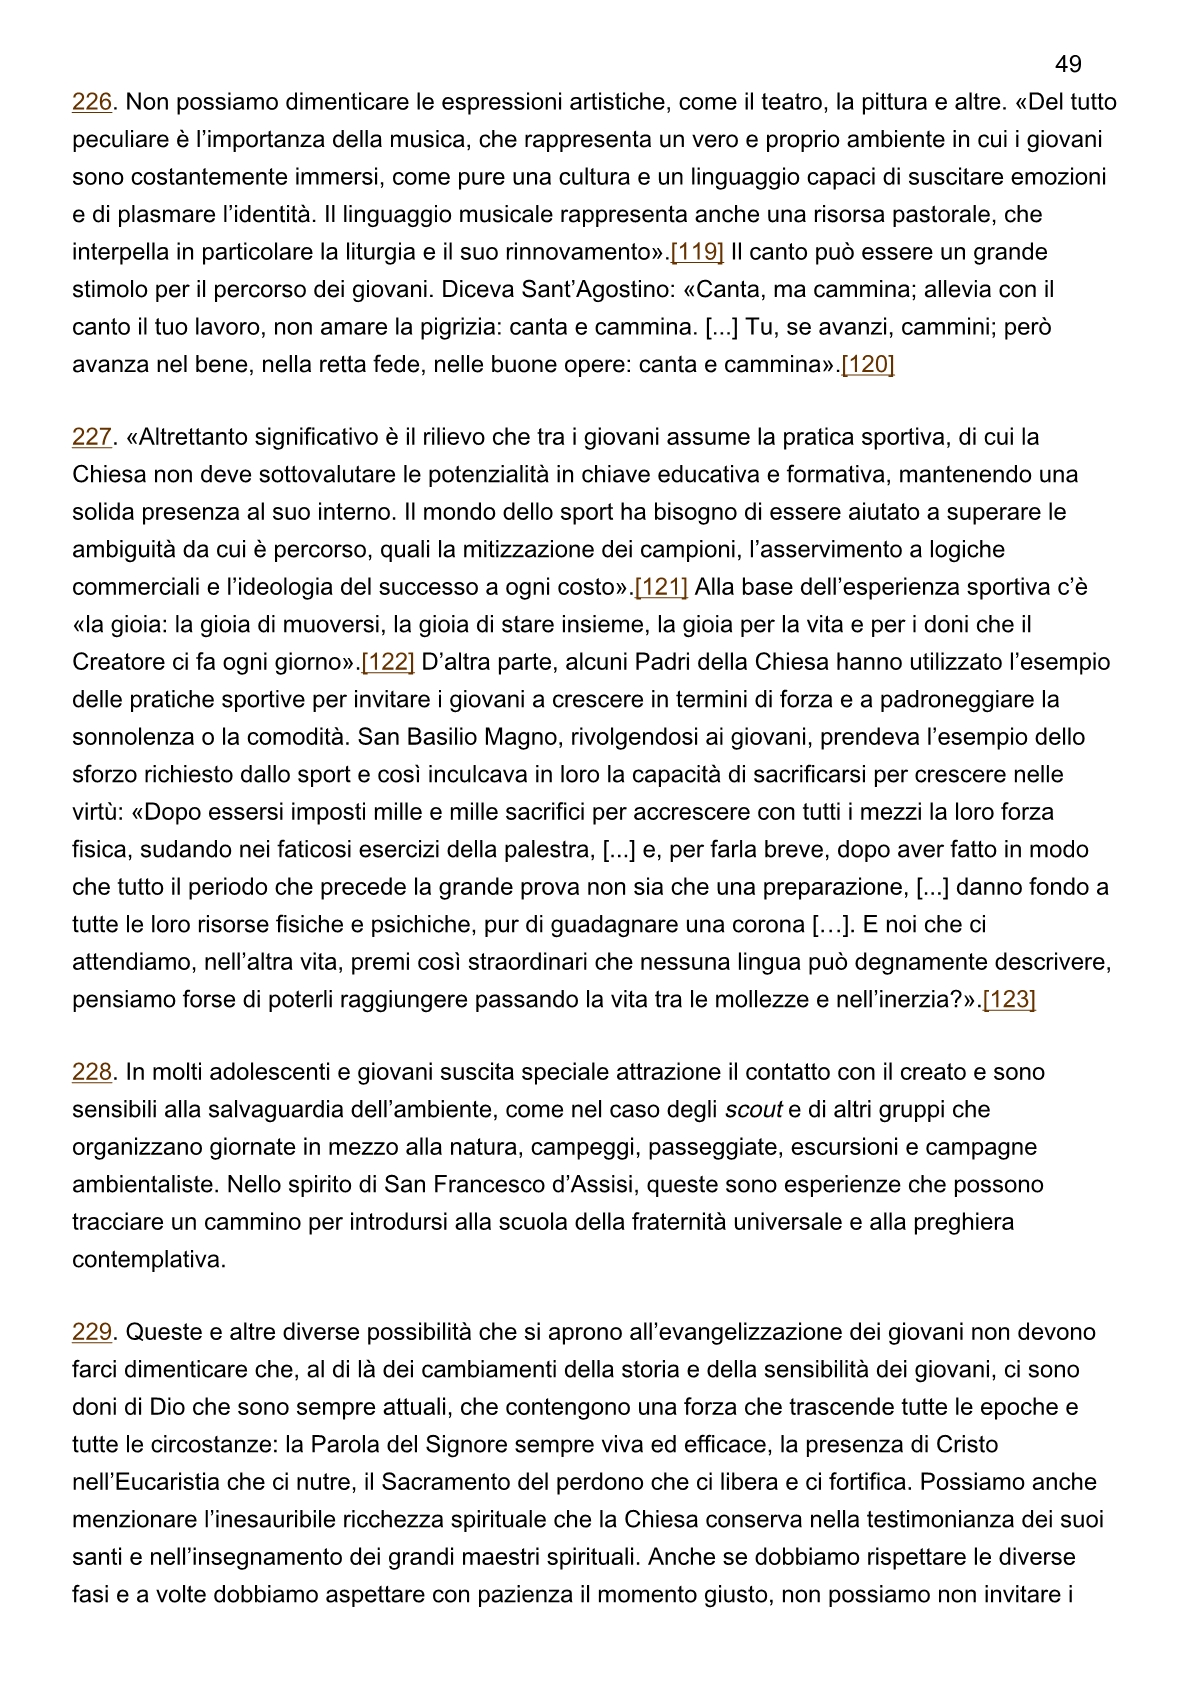 papa-francesco_esortazione-ap_20190325_christus-vivit49